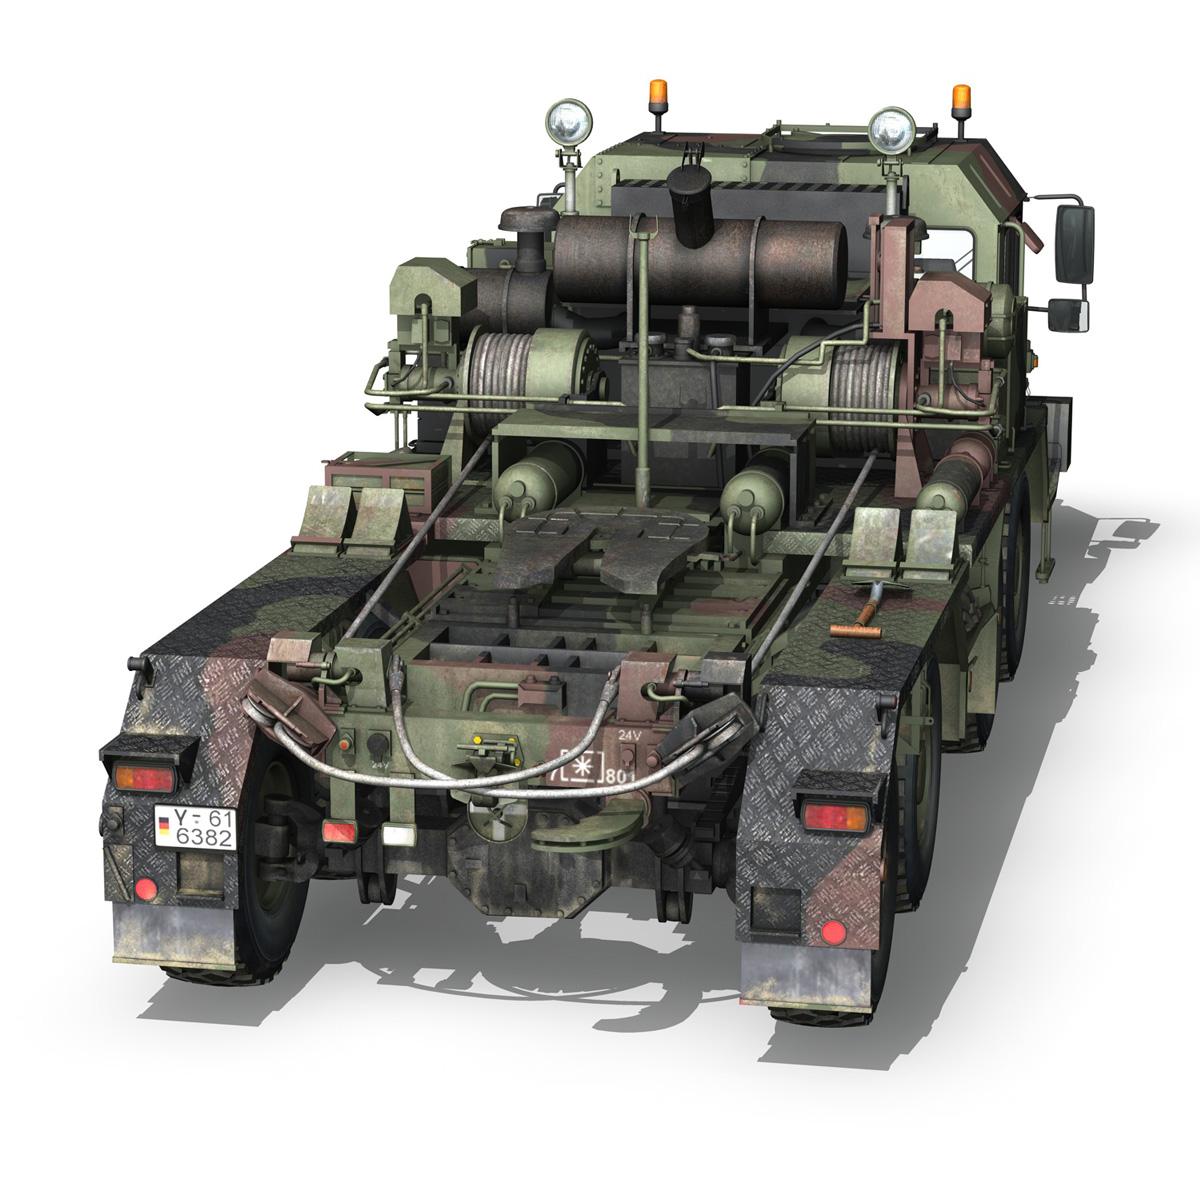 faun stl-56 transportues tank 3d model 3ds fbx c4d lwo obj 201915